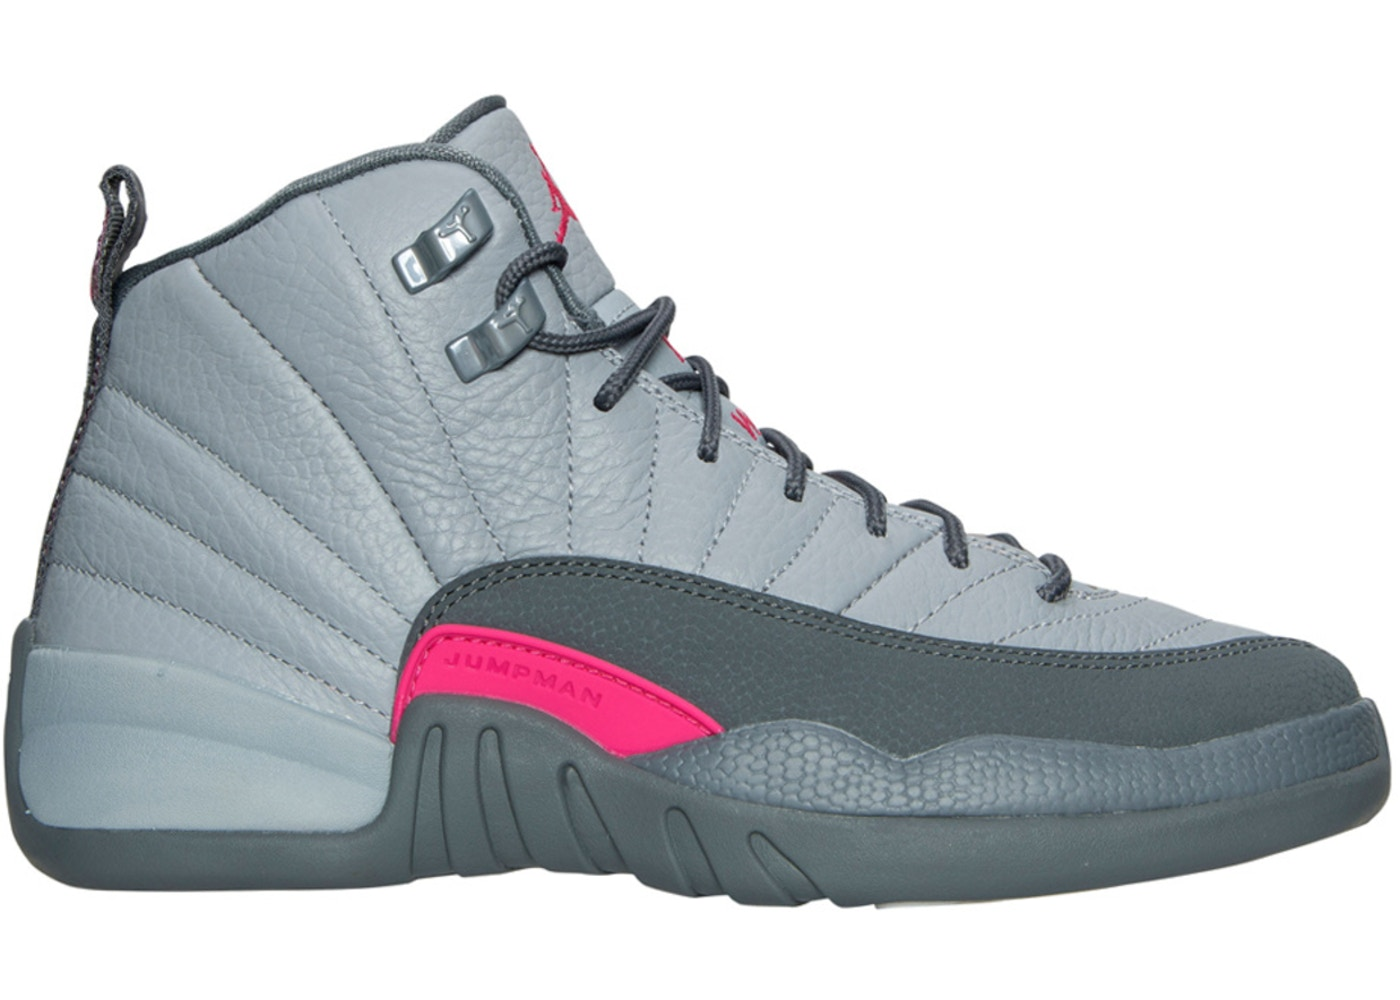 huge discount eb586 05433 Jordan 12 Retro Wolf Grey Vivid Pink (GS)